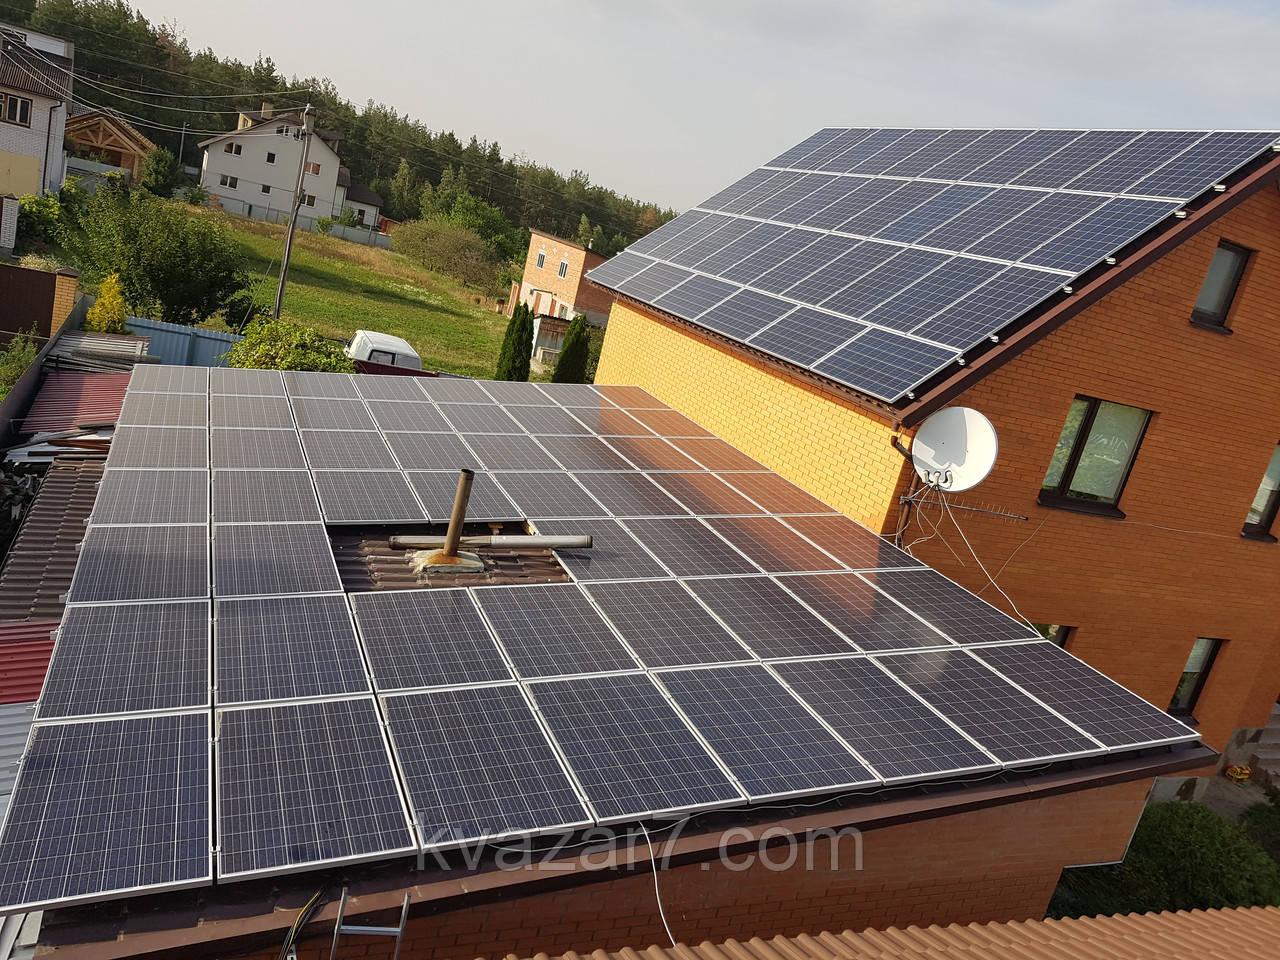 Сонячна електростанція 20 кВт мережева дахова